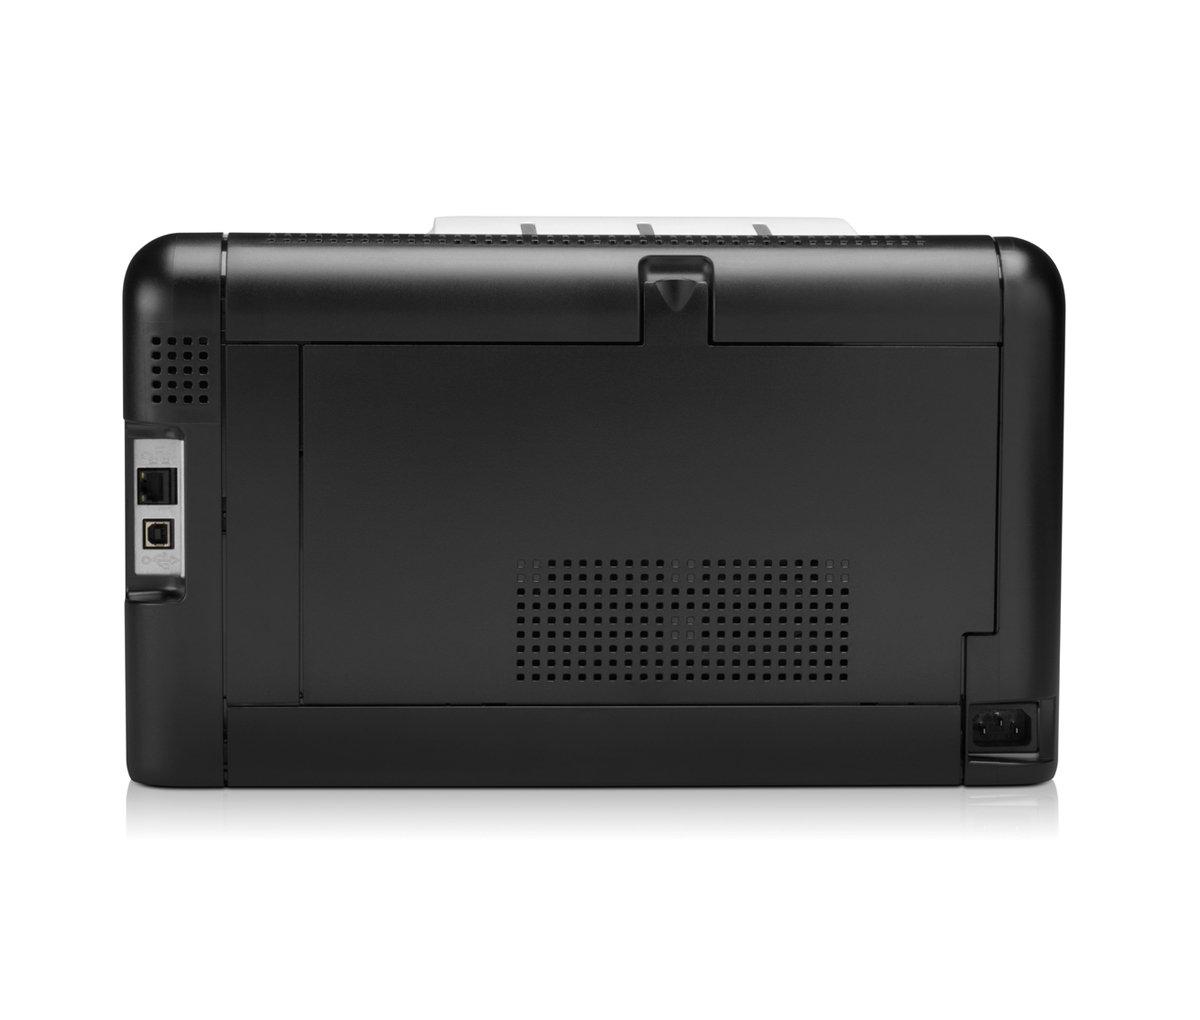 HP LaserJet Pro CP1525nw Back View